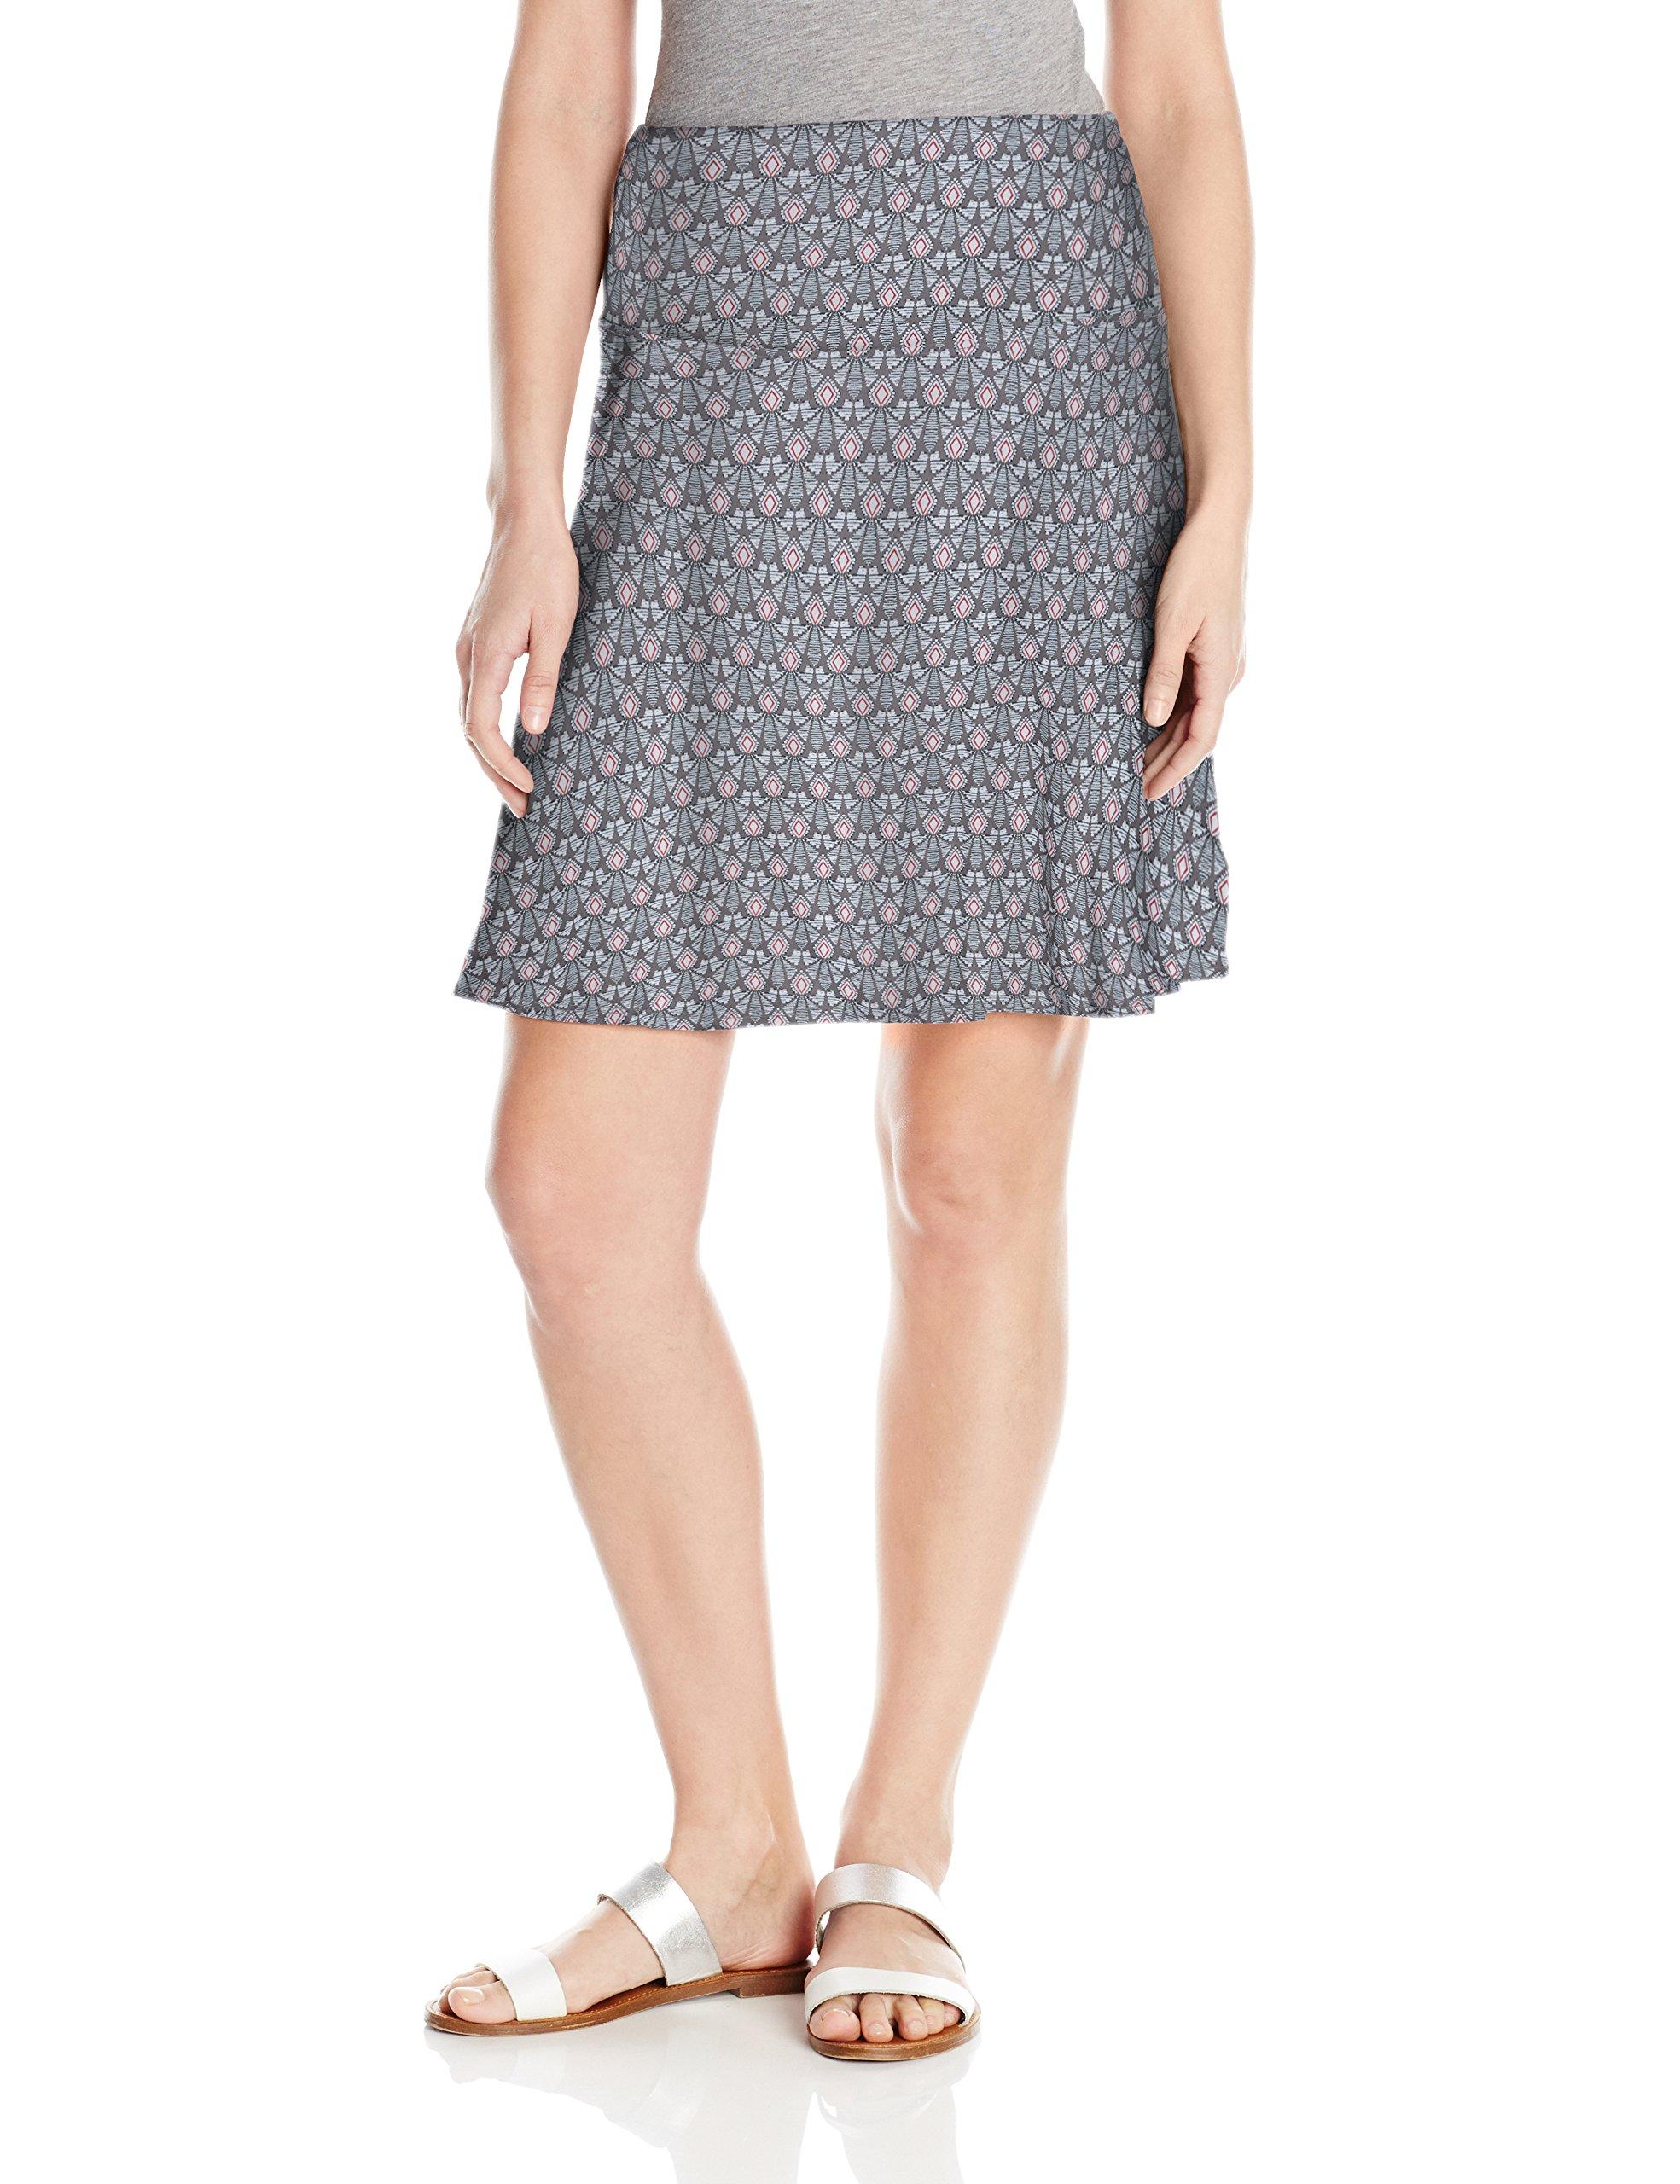 prAna Women's Taj Printed Skirt, Moon Rock Botanical, Large